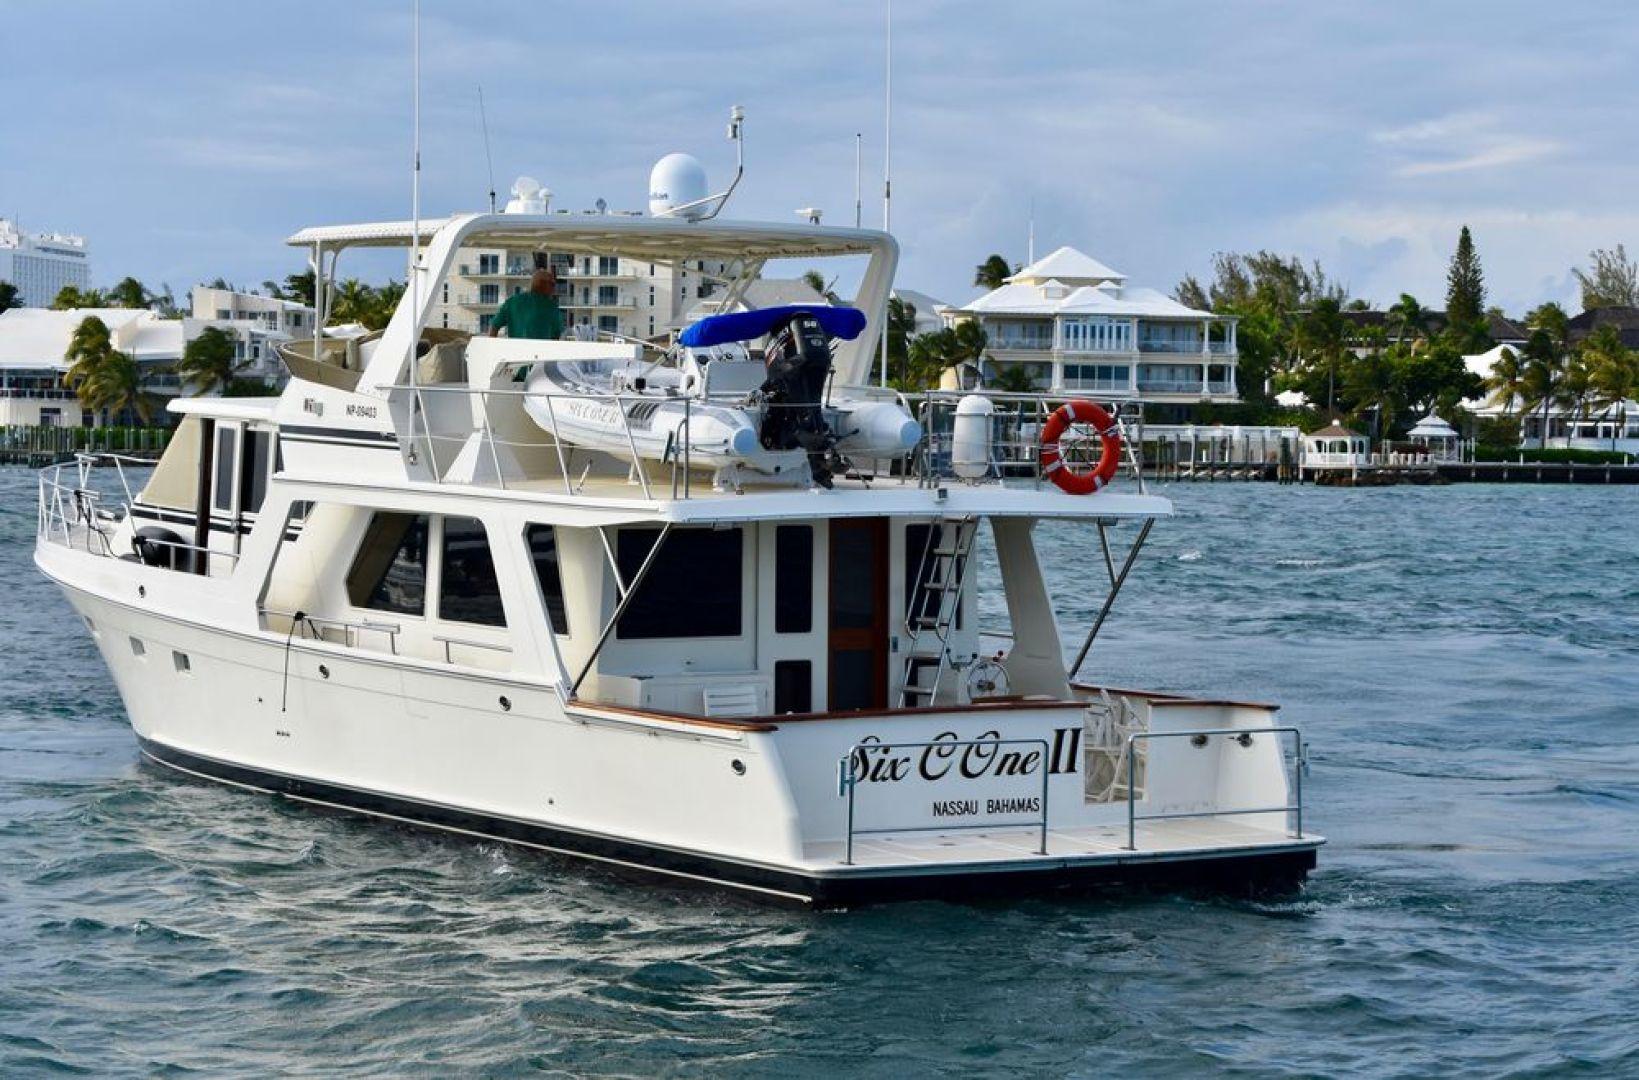 Offshore Yachts-Pilot House 2000-Six C One II Nassau-Bahamas-1275715 | Thumbnail